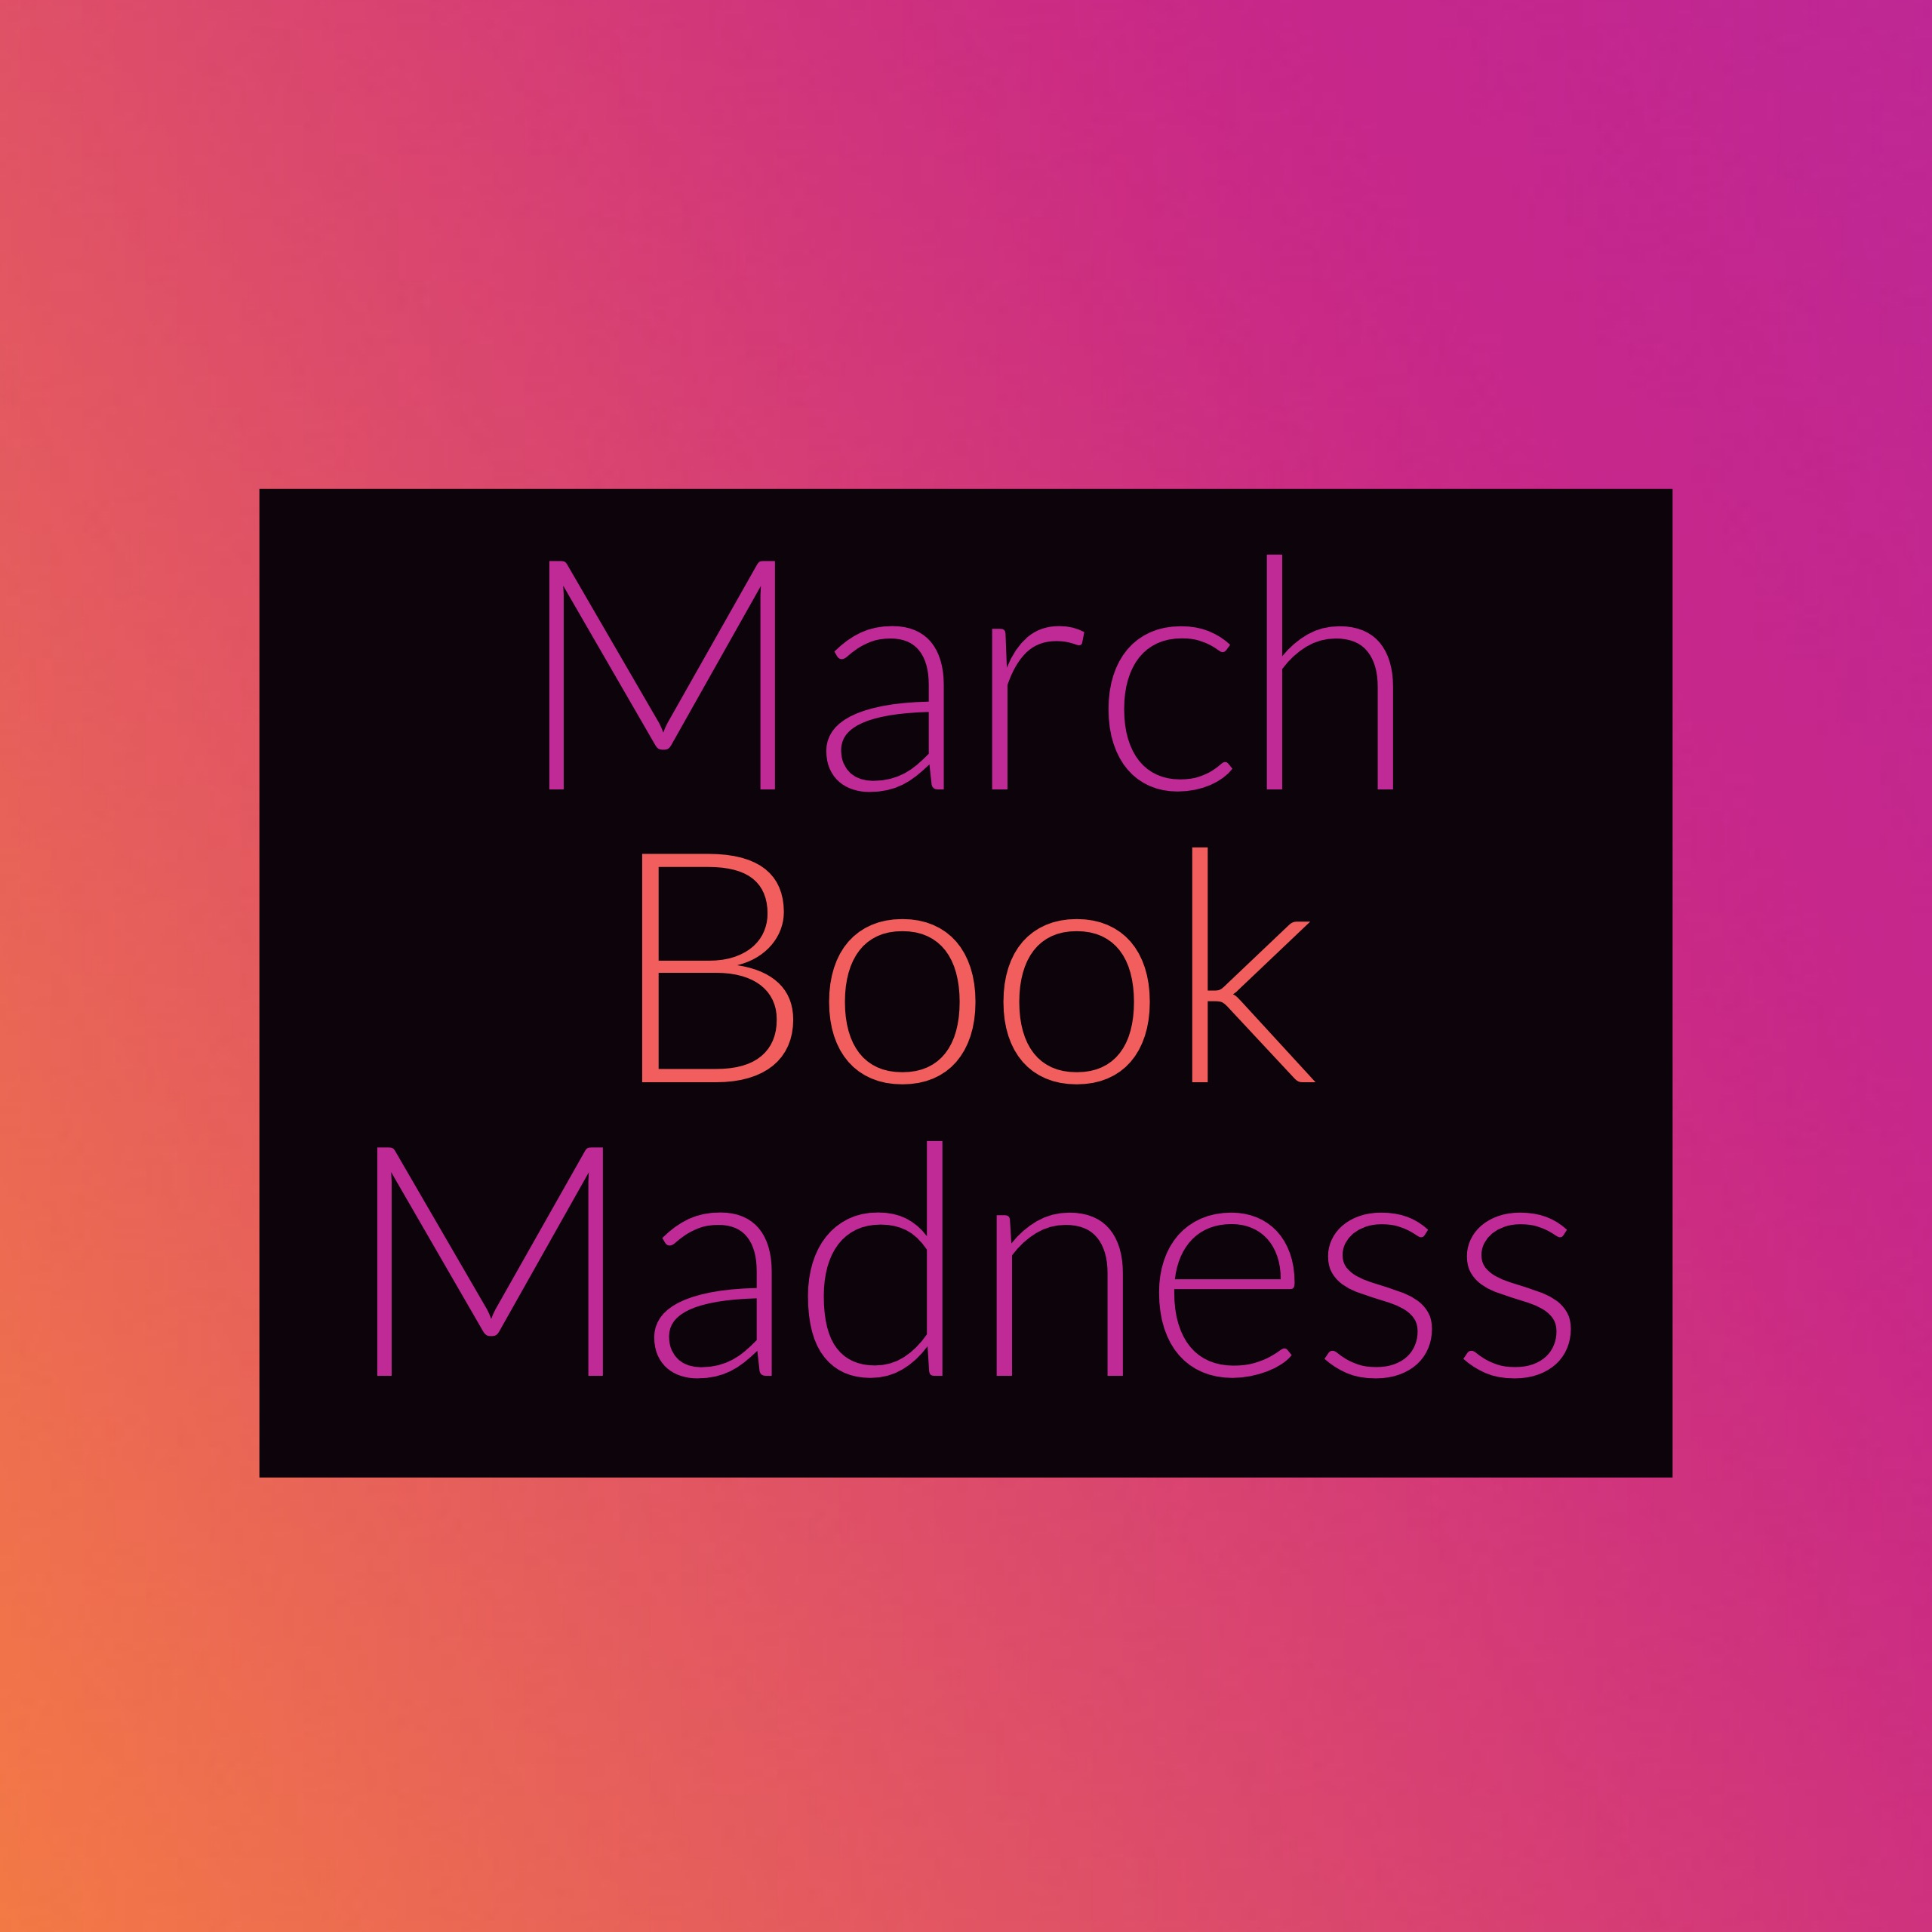 March Book Madness